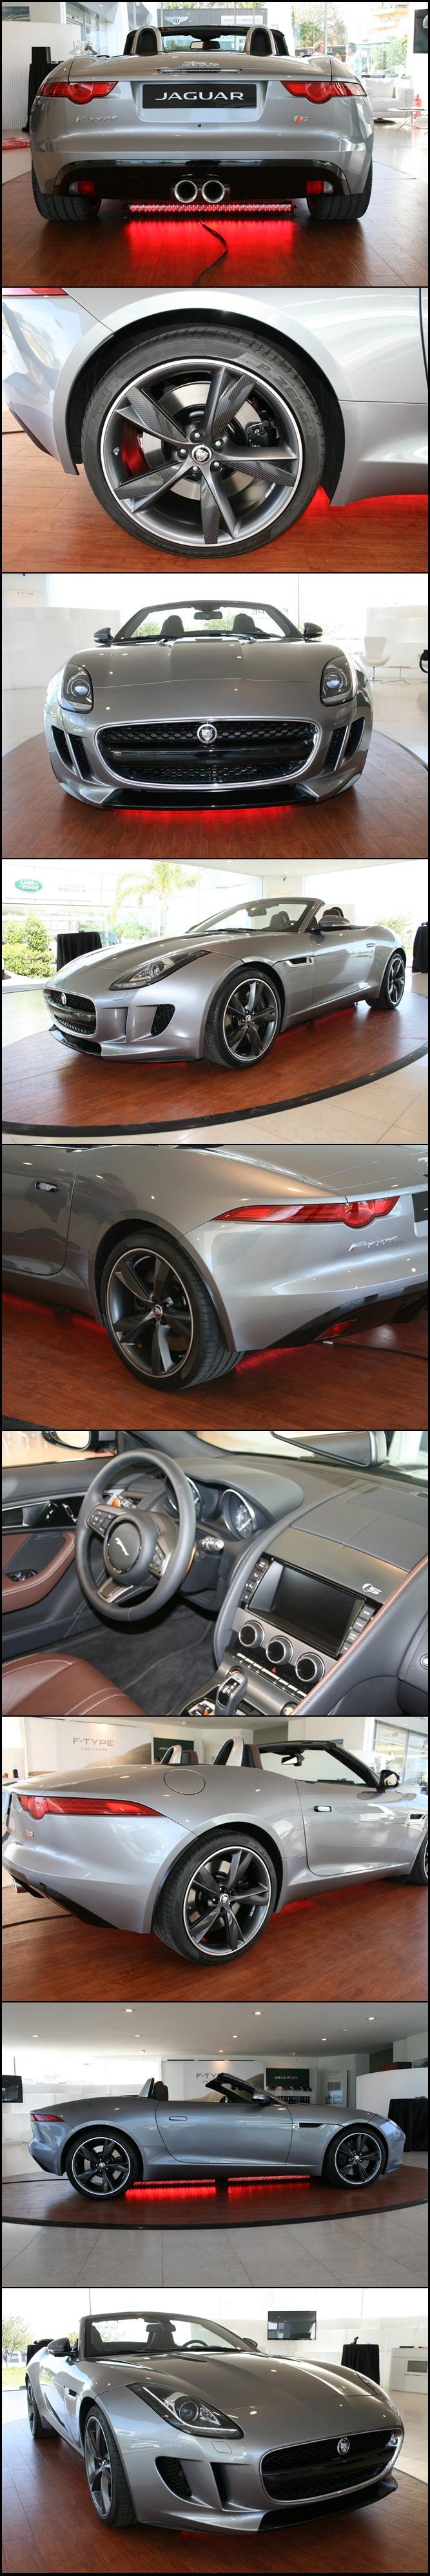 Jaguar Type F